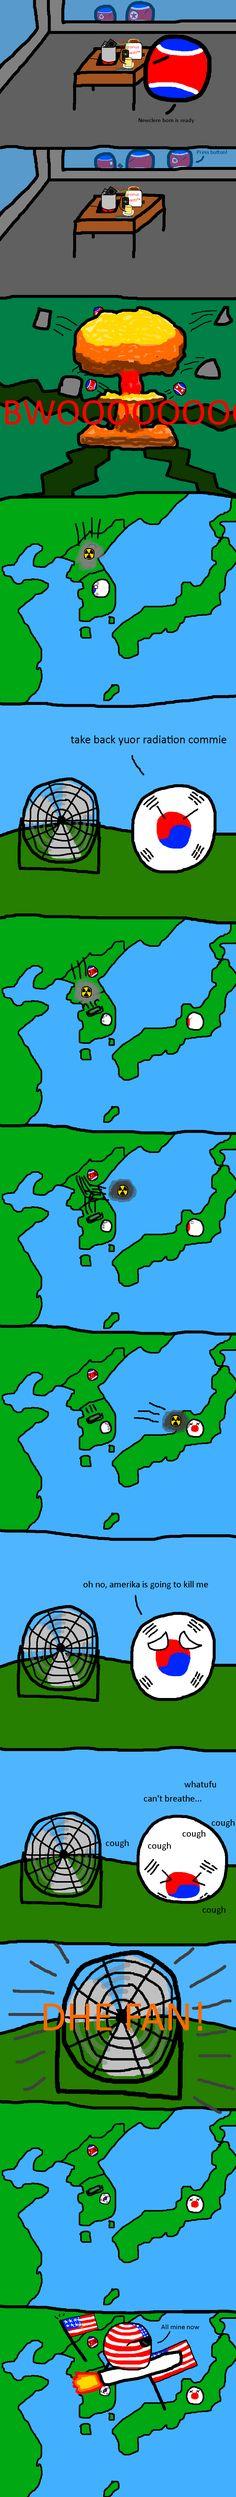 Nuclear leakage   Polandballs Countryballs